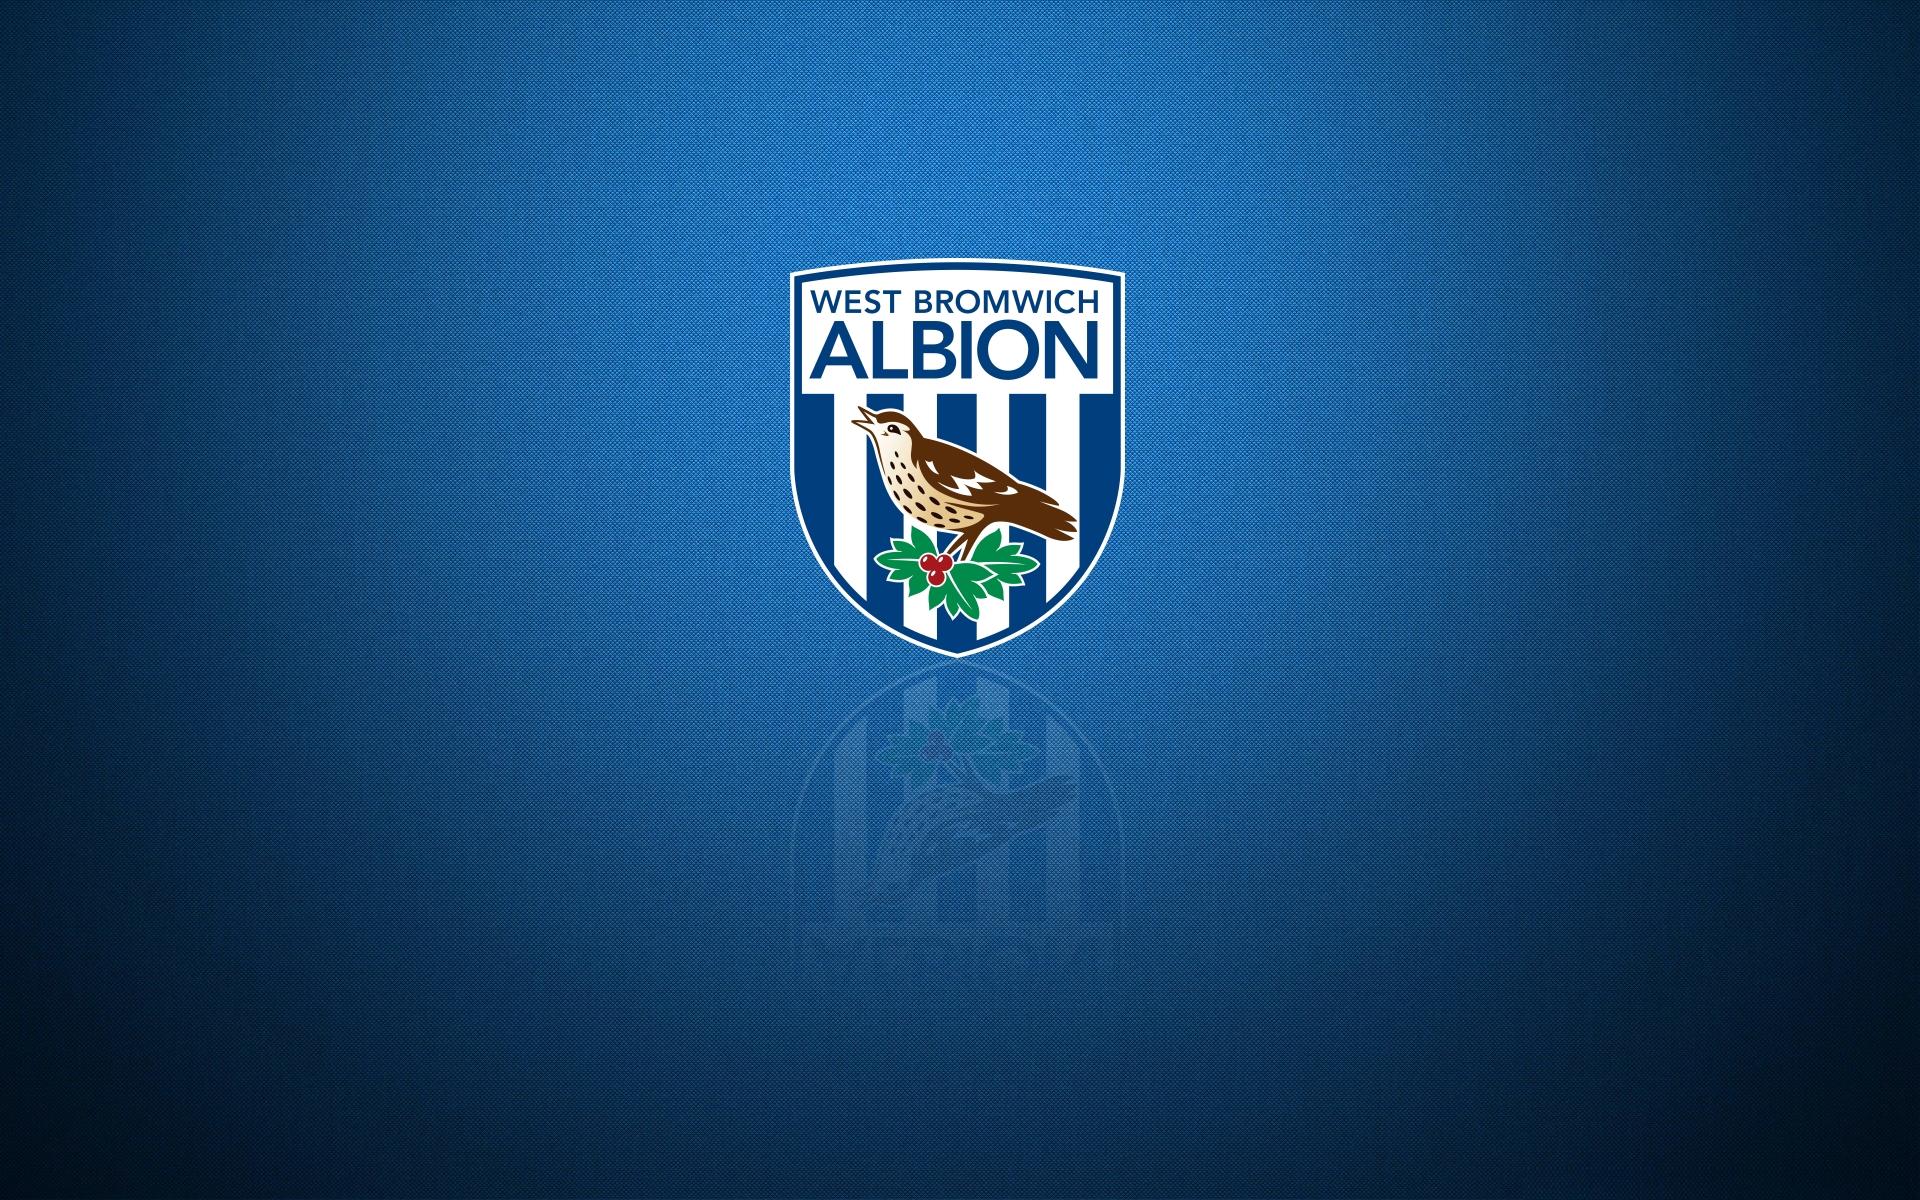 West Bromwich Albion FC Logos Download